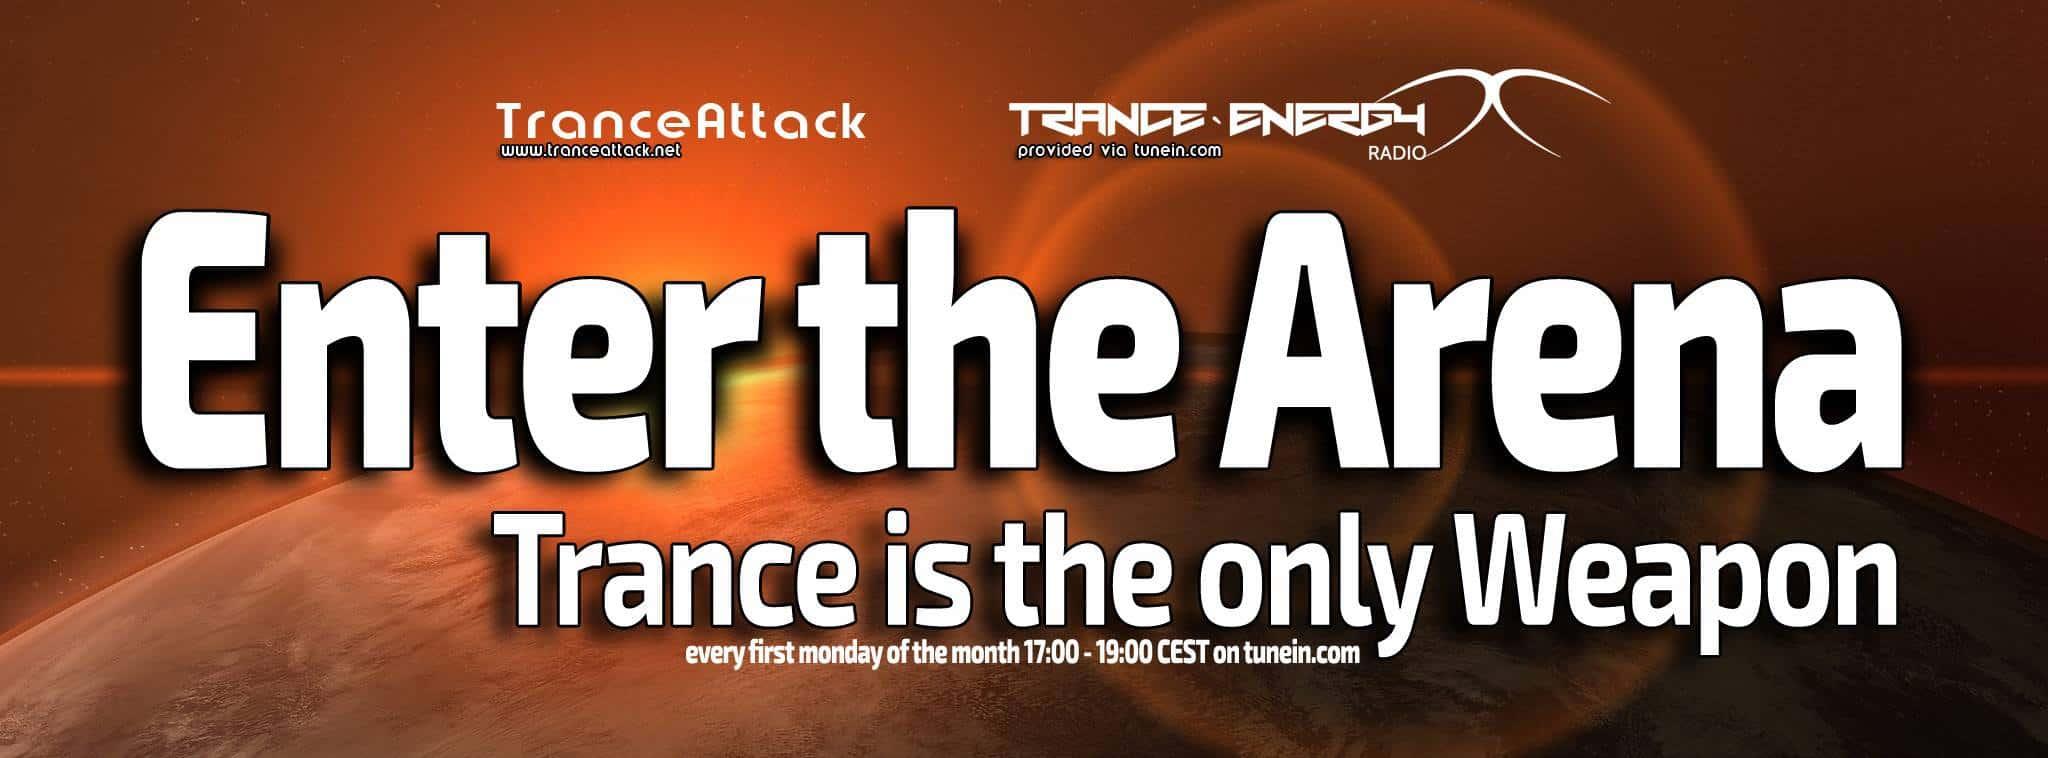 Enter The Arena on TranceEnergy-Radio